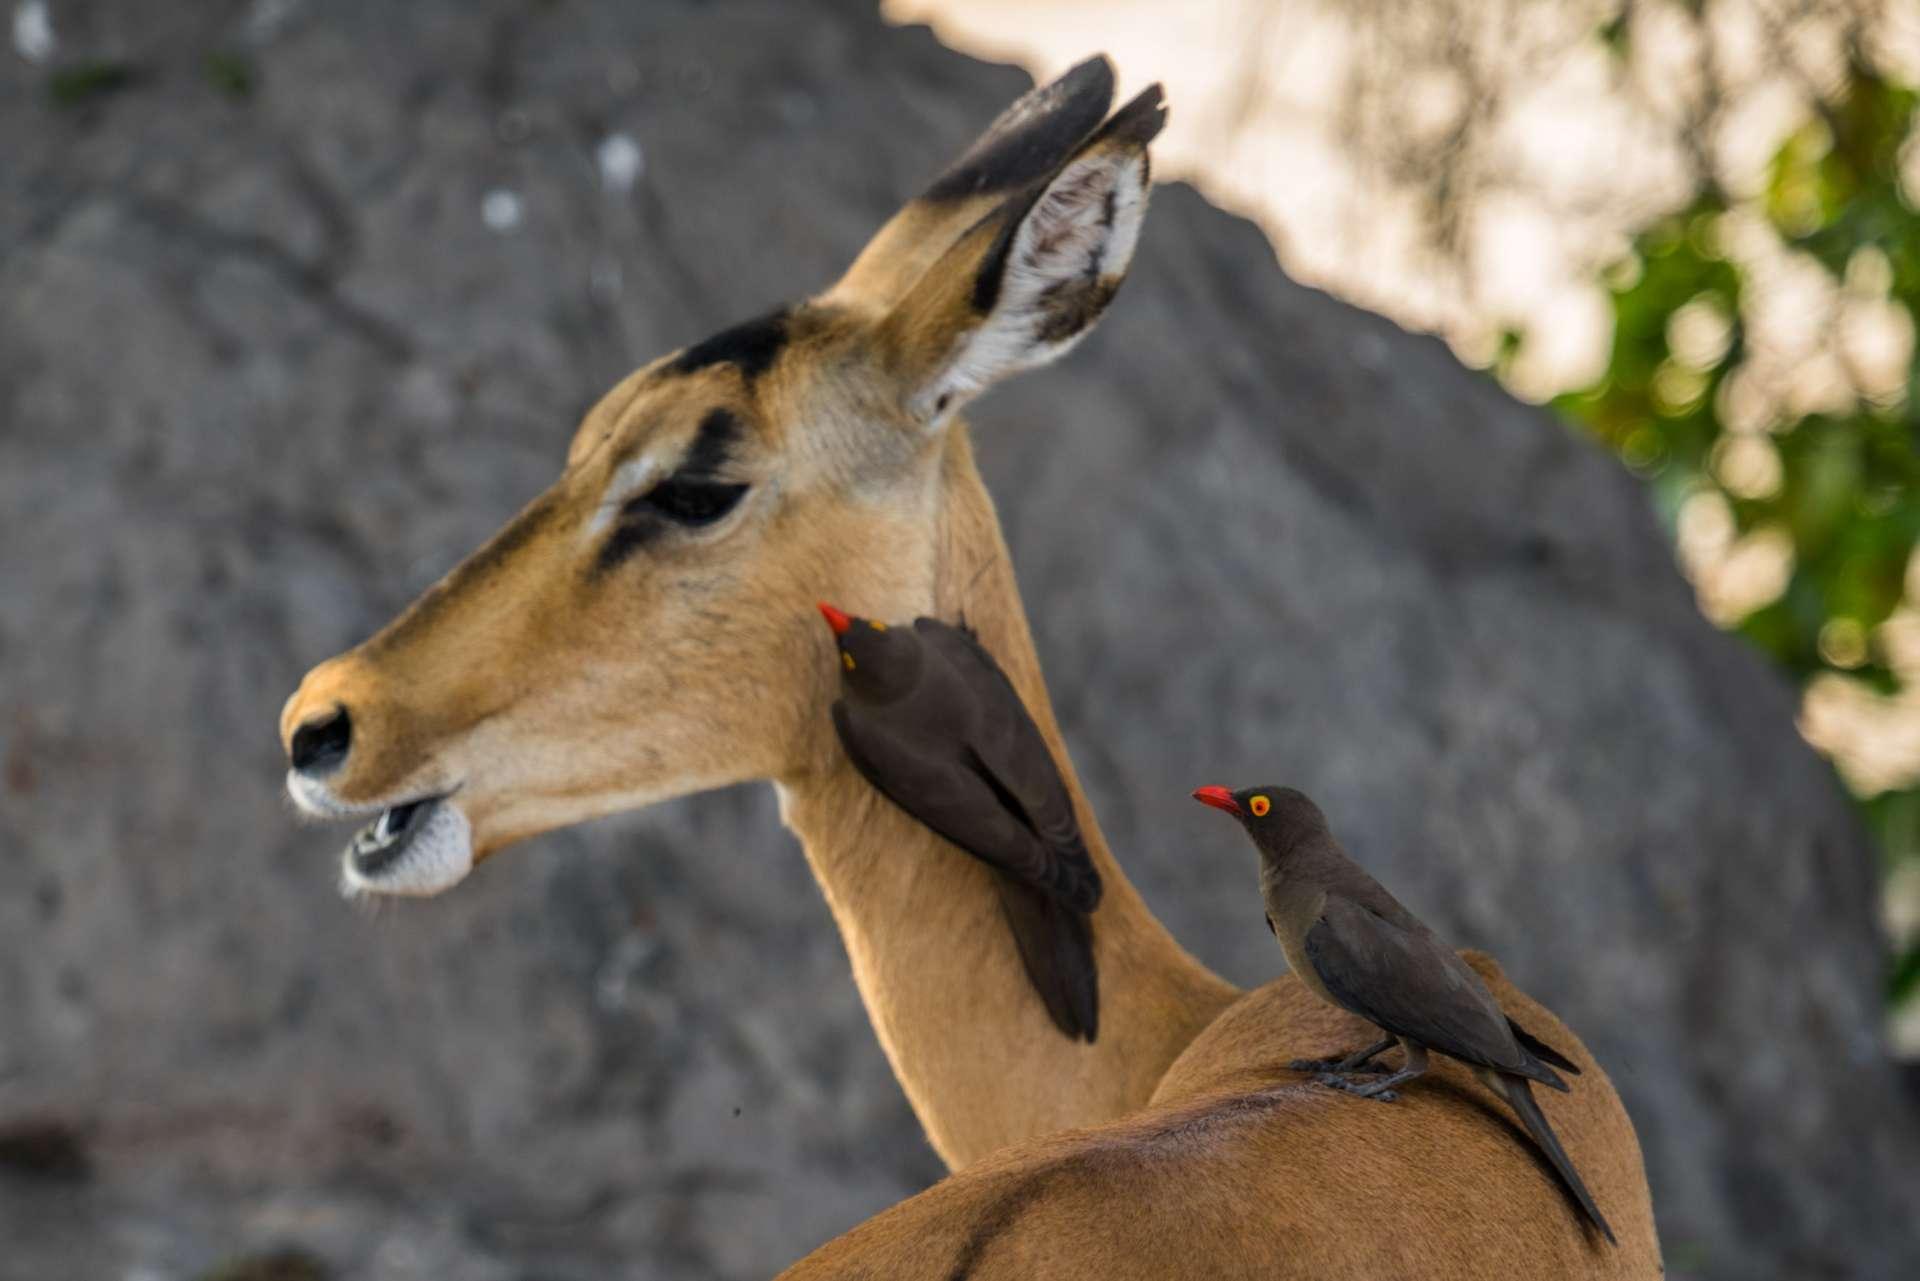 Victoria Falls Zimbawe Enrico Pescantini Chobe day trip safari